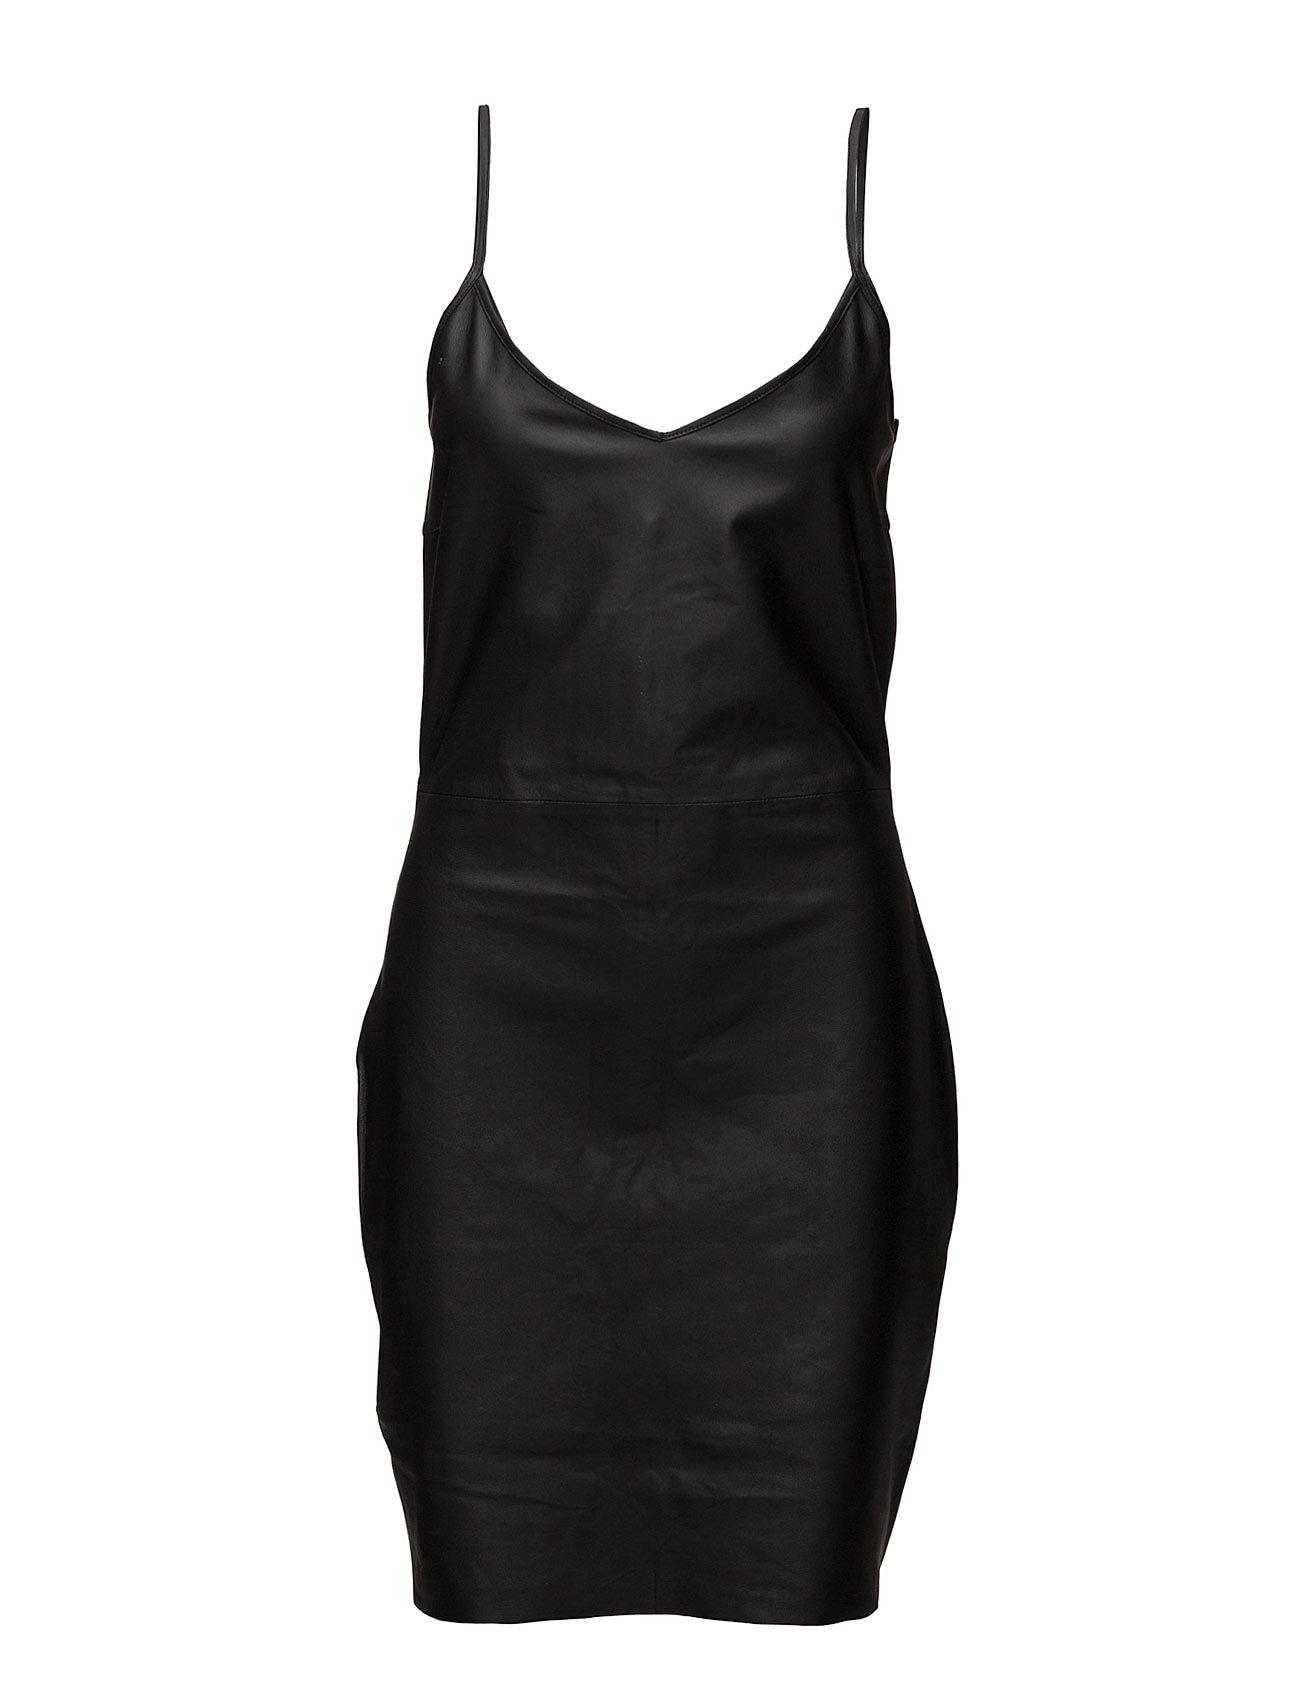 BLK DNM LEATHER DRESS 3